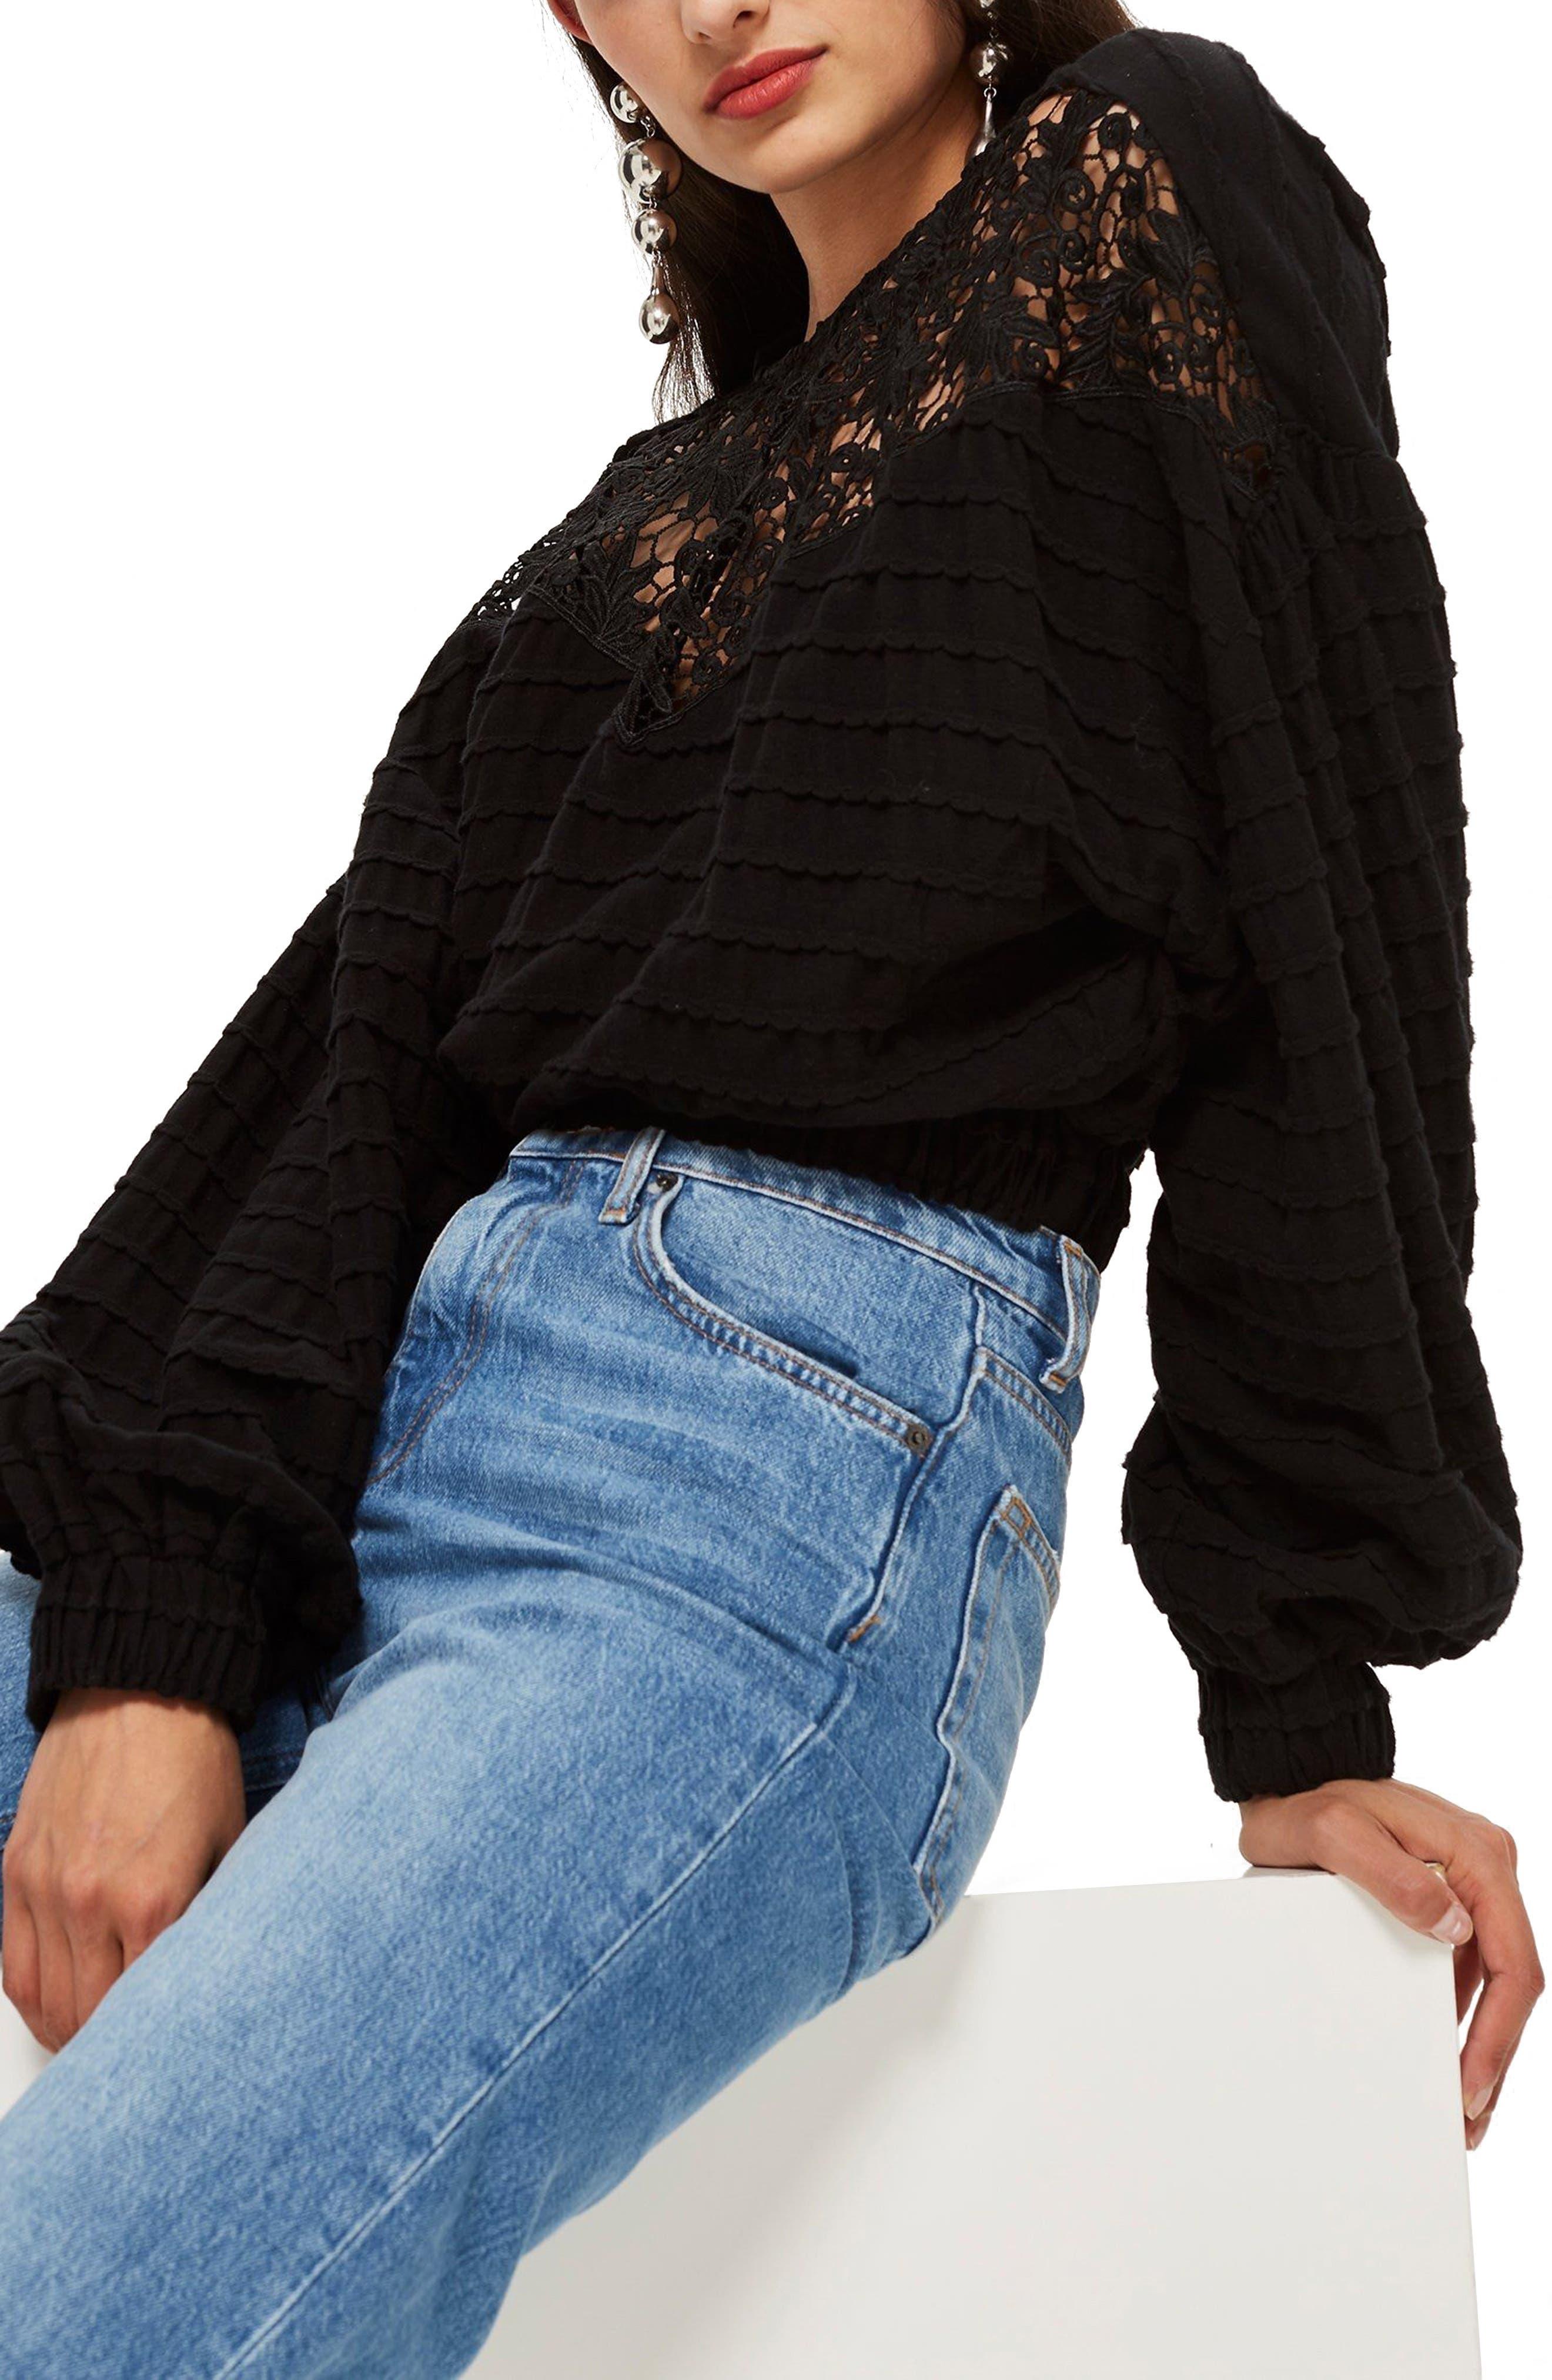 Crochet Inset Top,                             Main thumbnail 1, color,                             Black